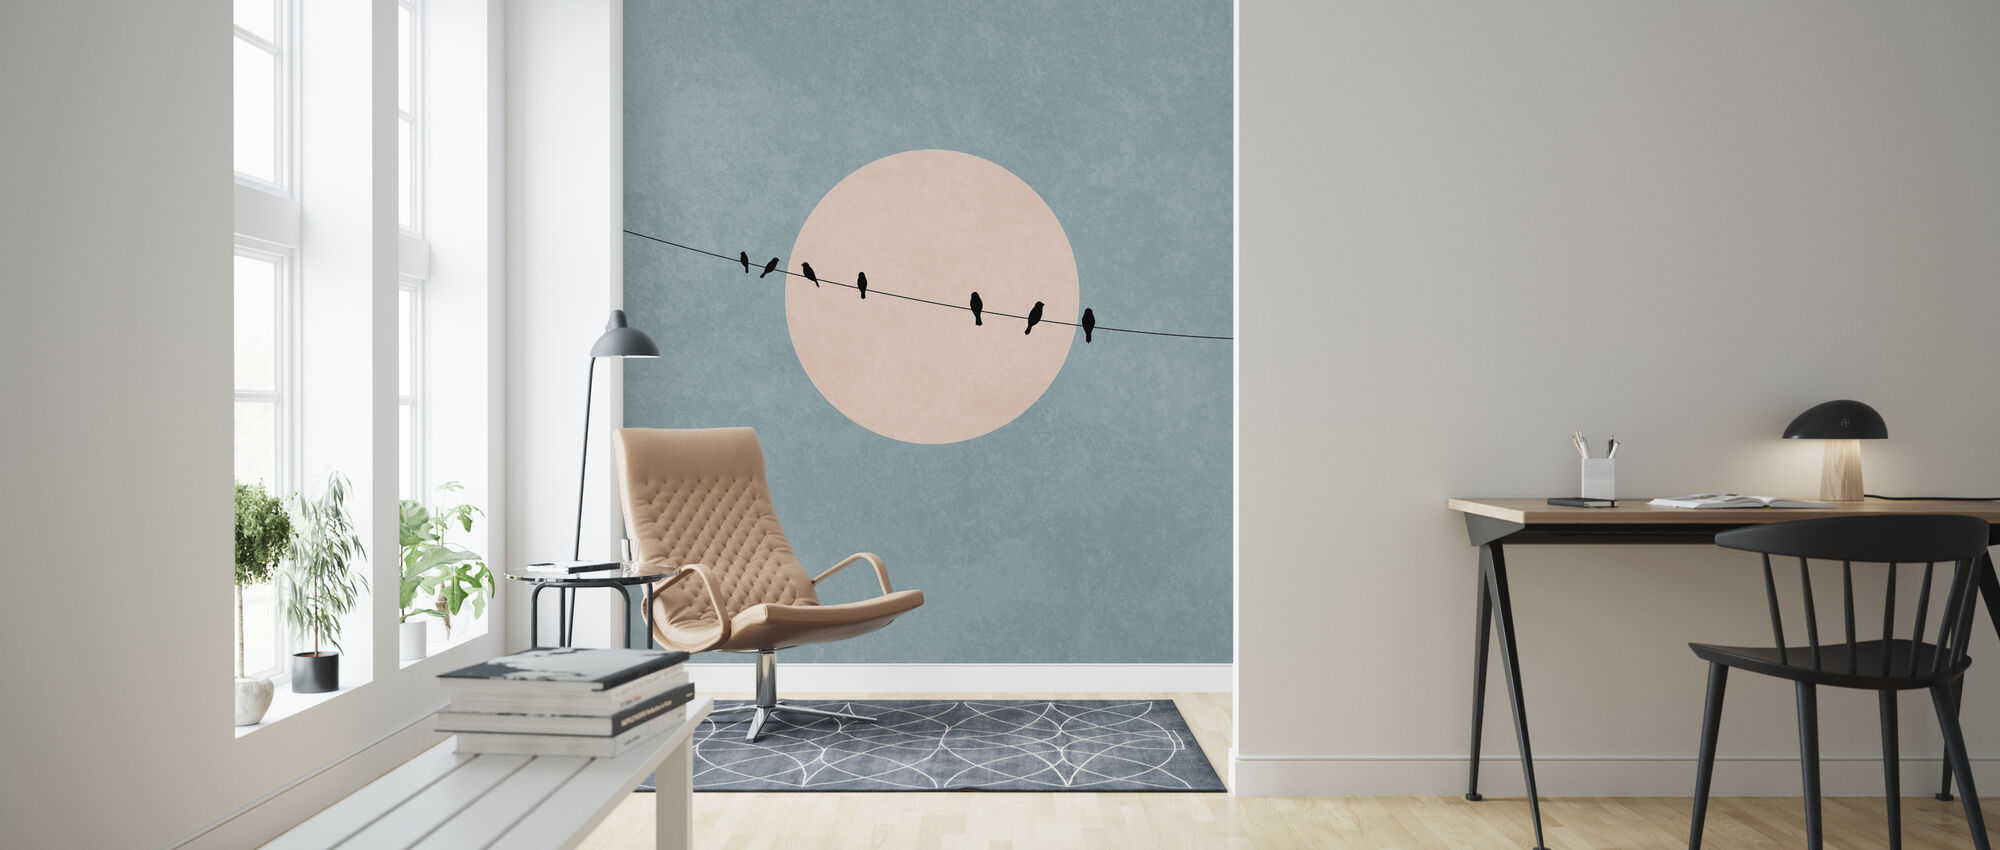 Beauty of Silence - Wallpaper - Living Room